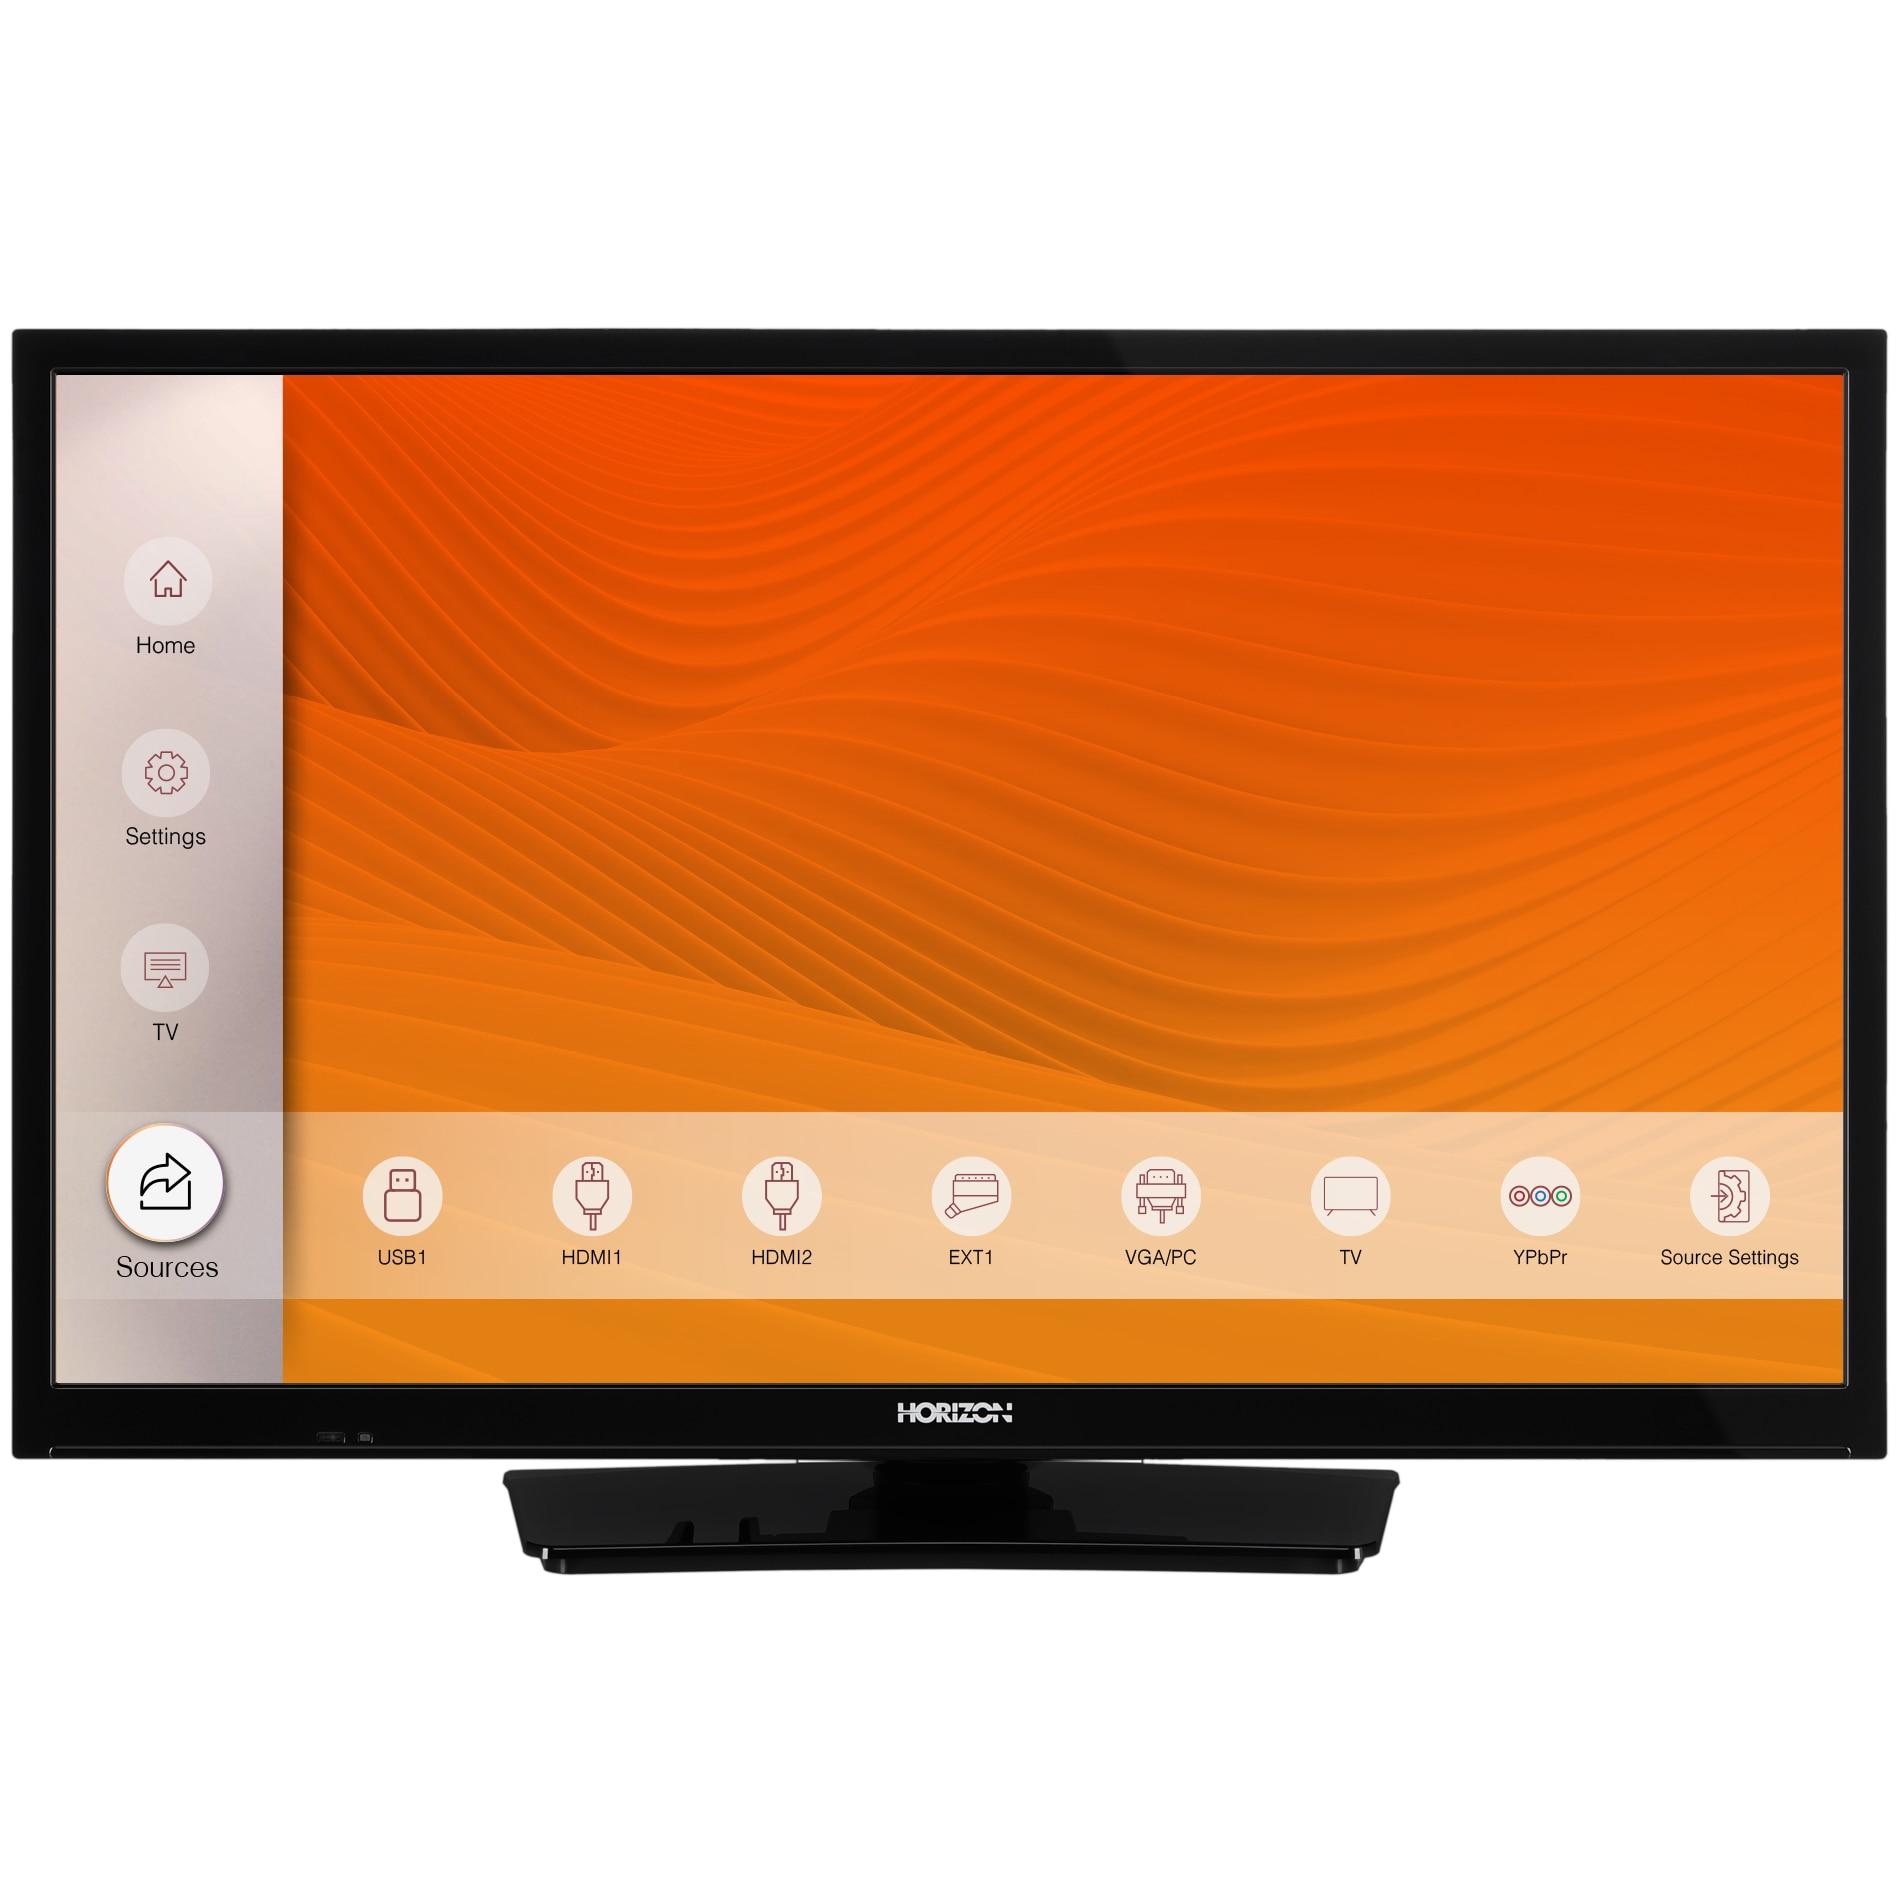 Fotografie Televizor Horizon 24HL6100H, 60 cm, HD, LED, Clasa A+